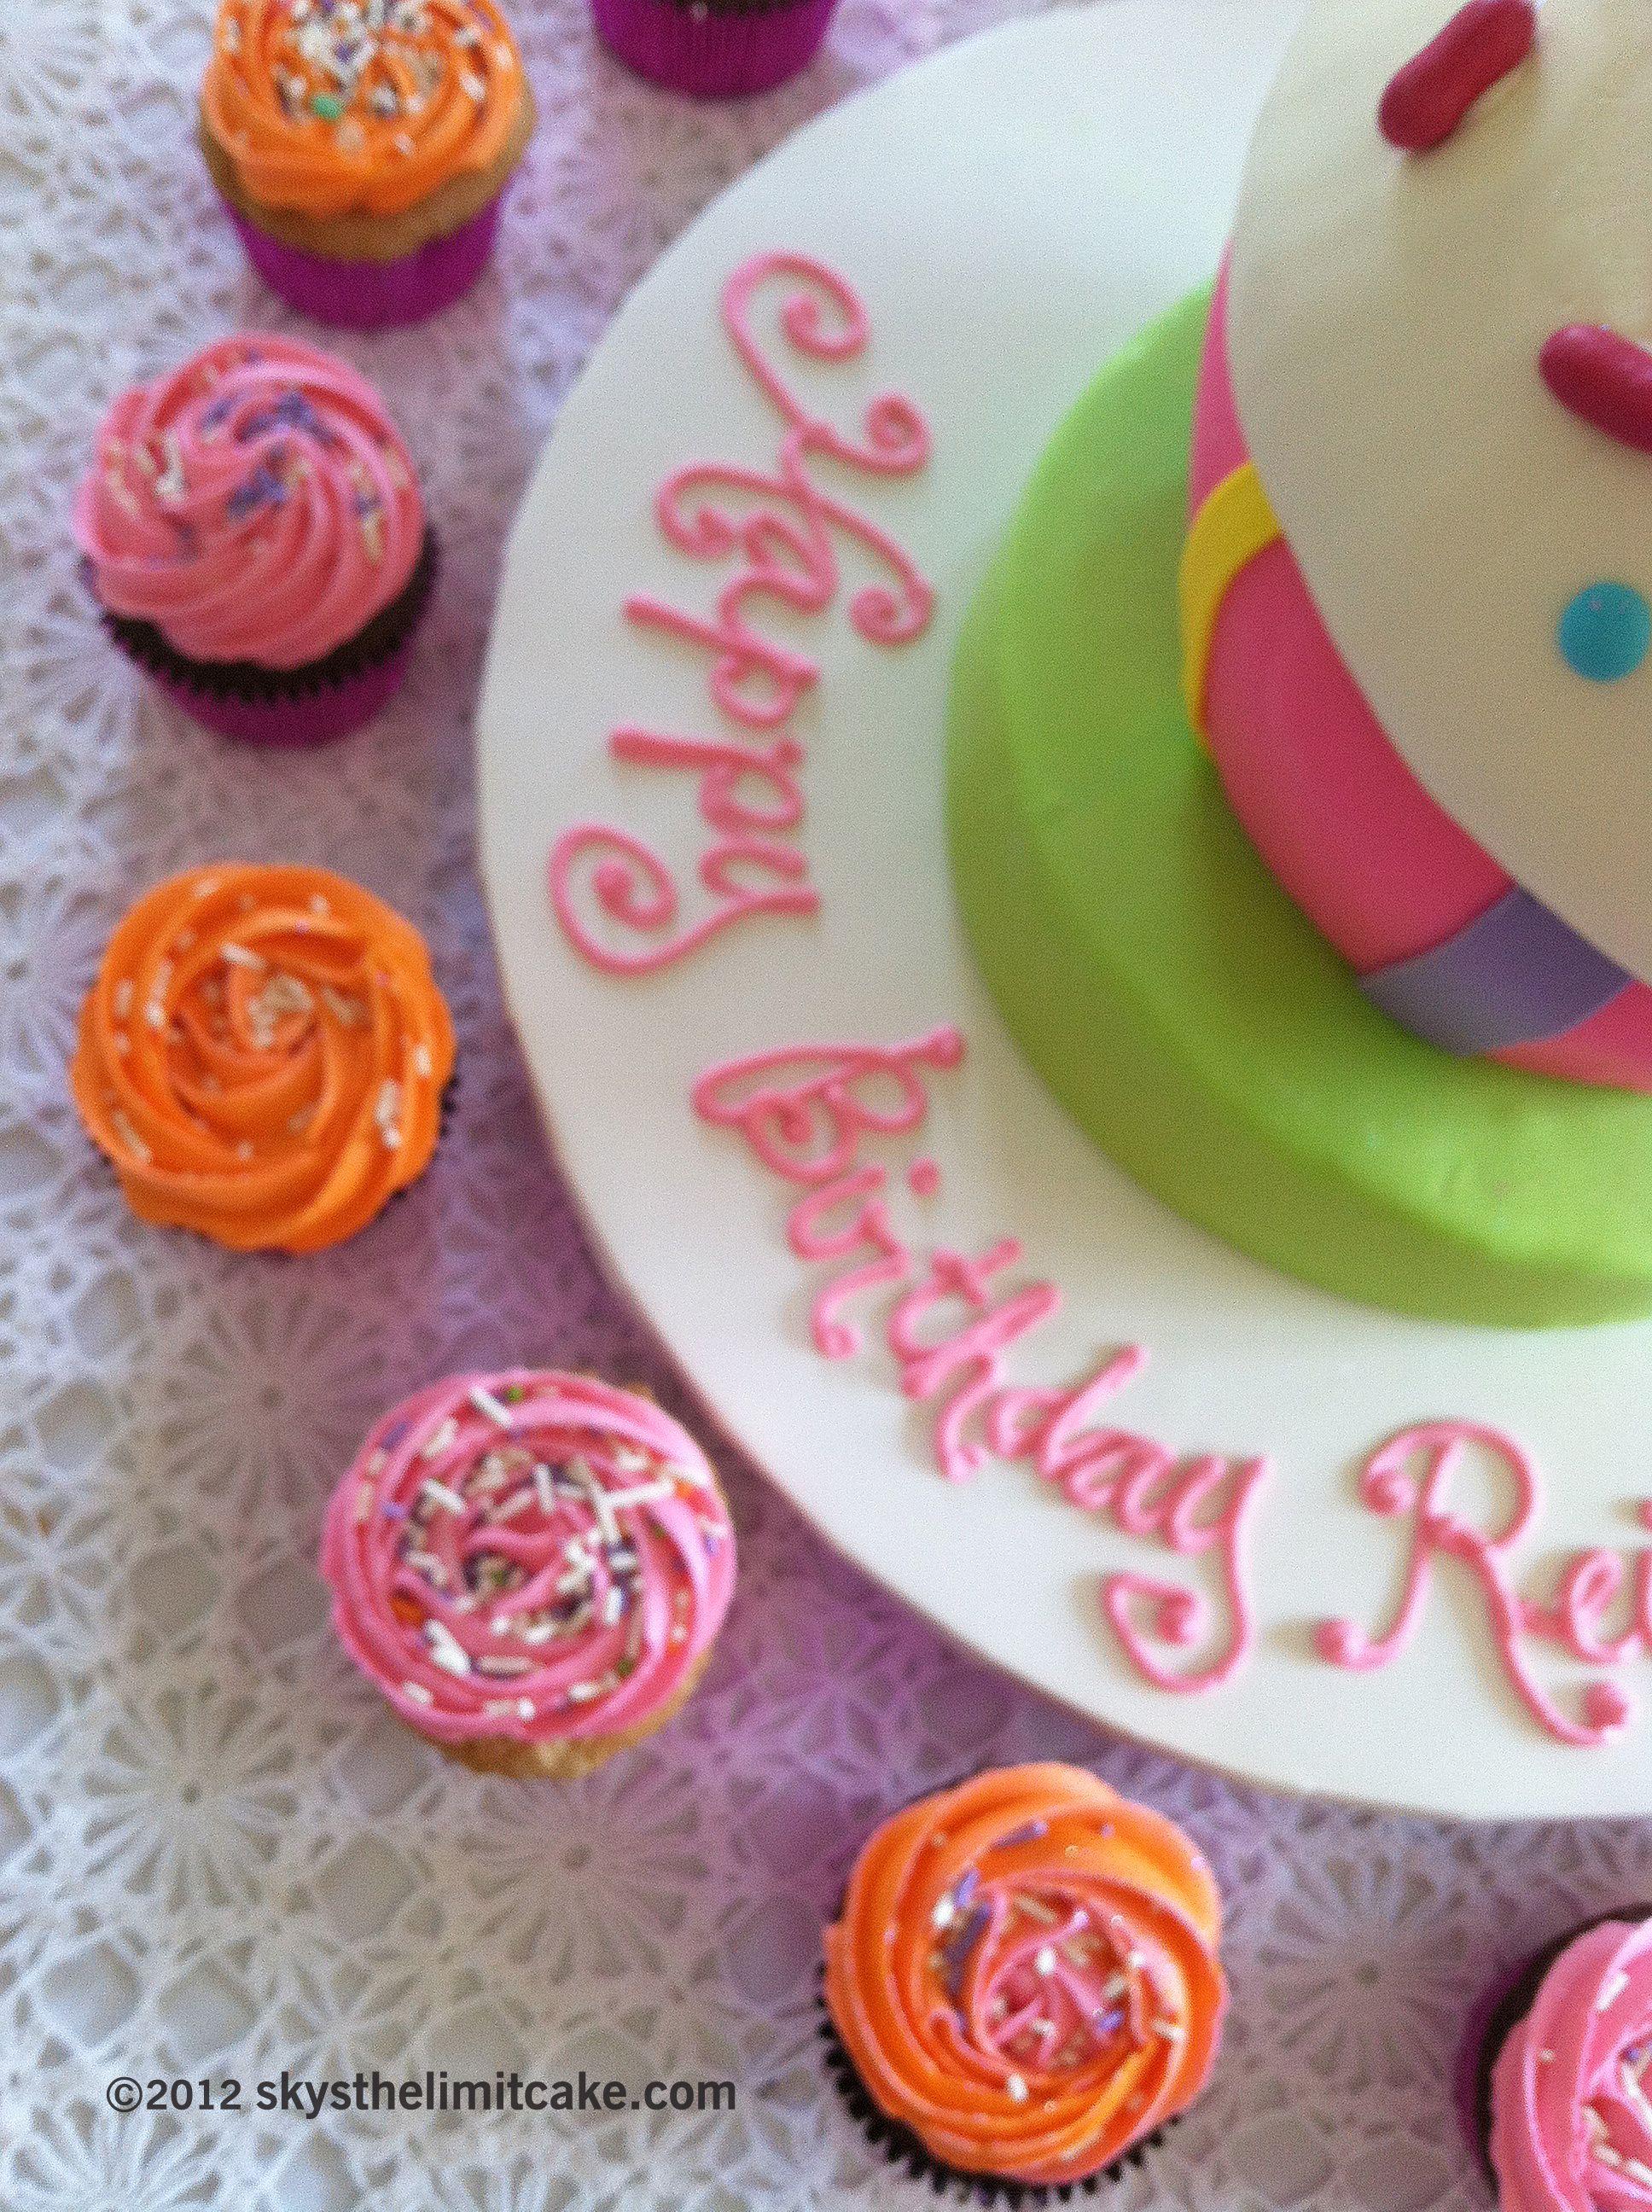 Miss Pink Poodle say Happy Birthday to you!    www.skysthelimitcake.com